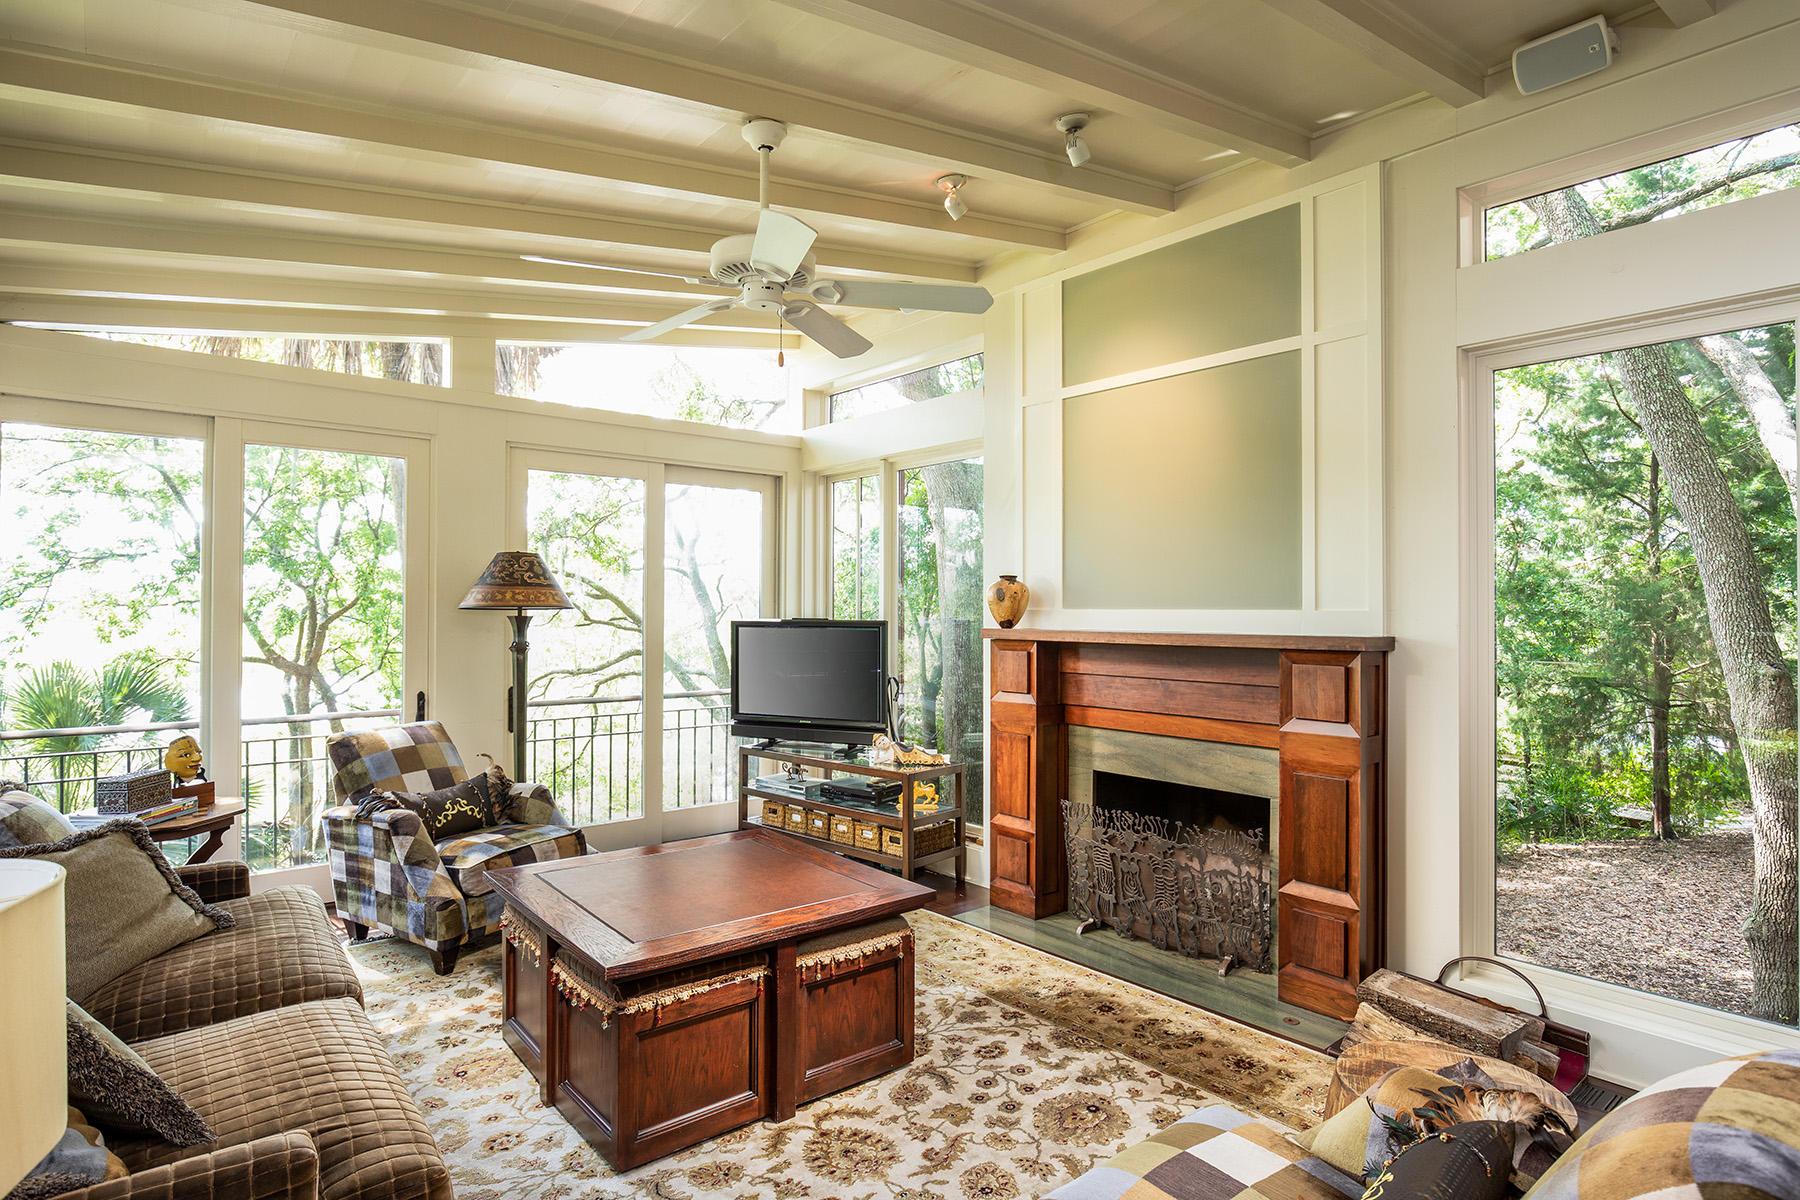 Ellis Oaks Homes For Sale - 672 Ellis Oak, Charleston, SC - 15